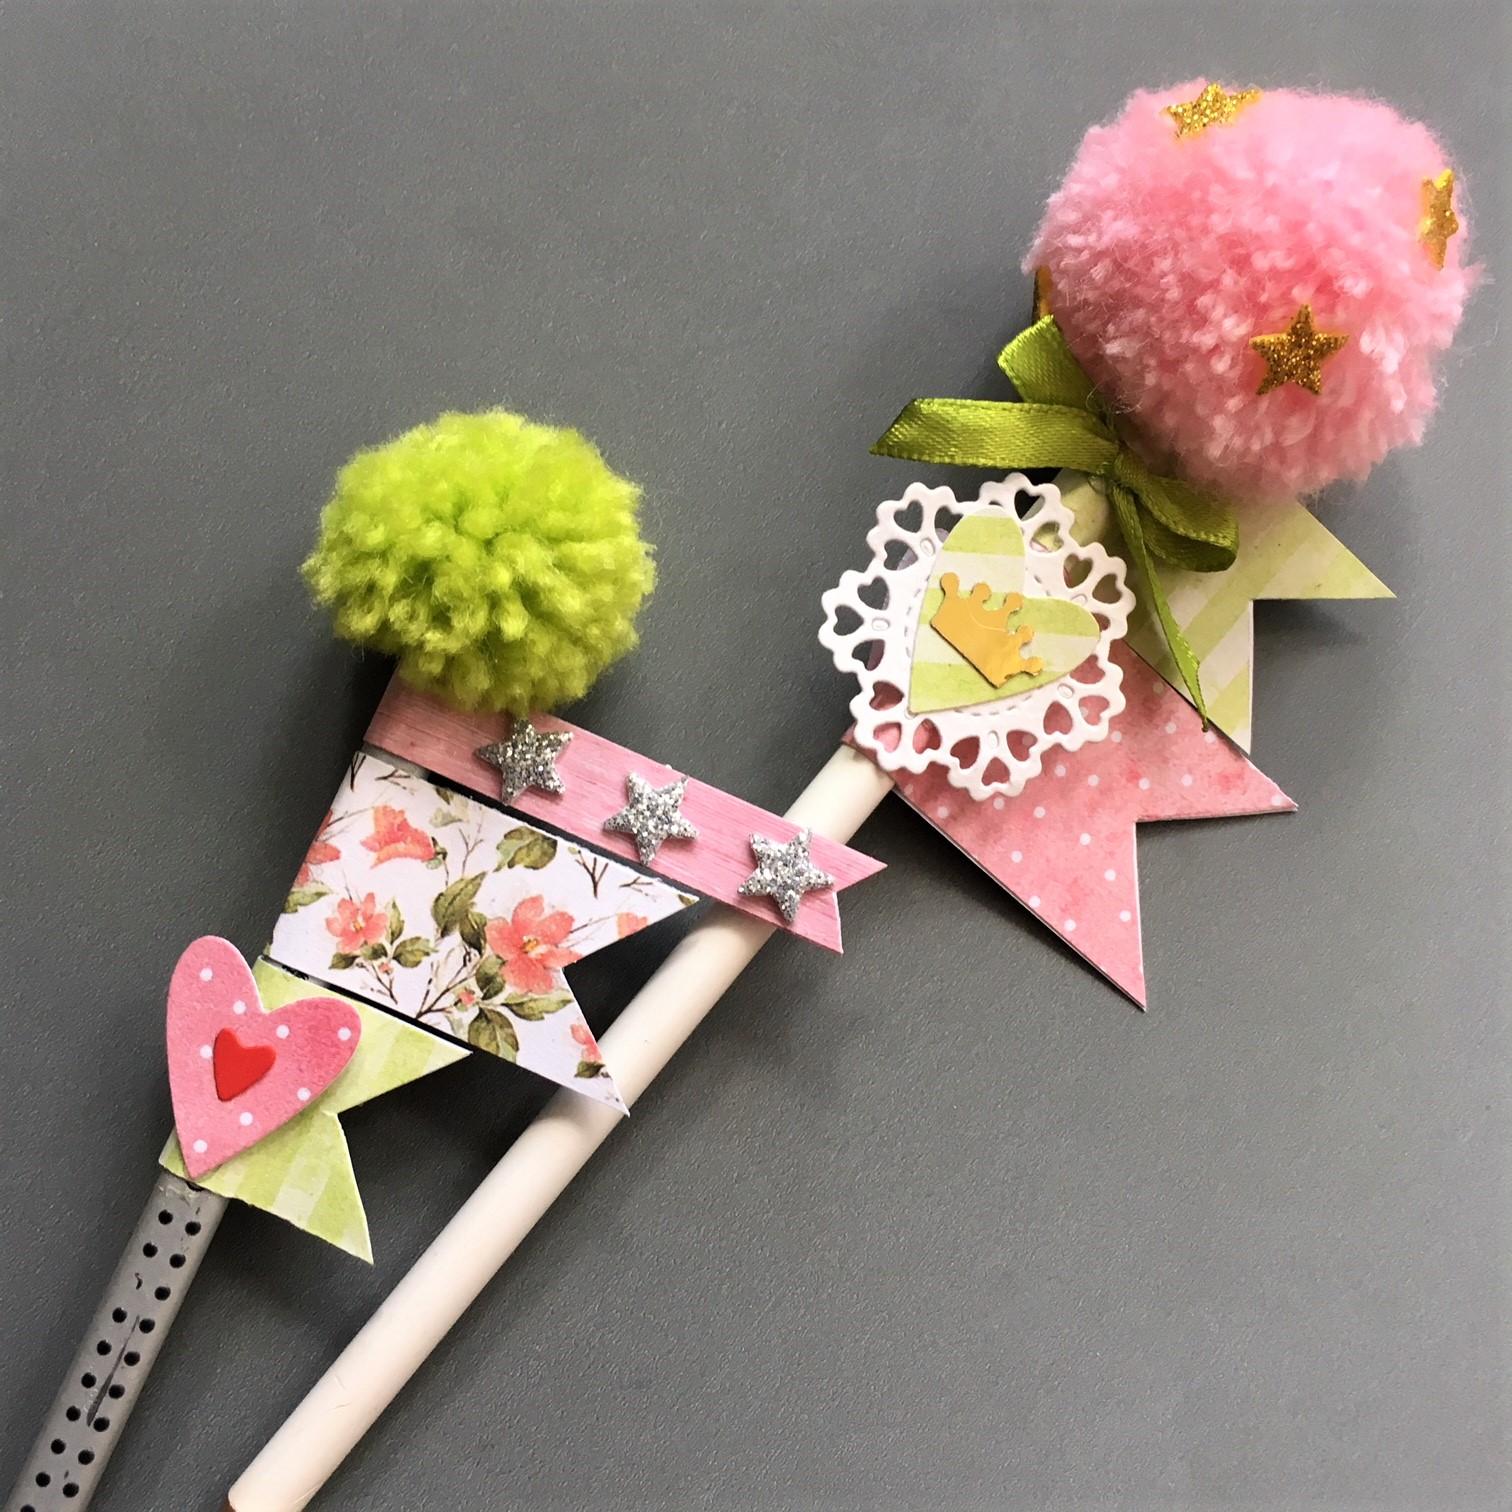 decorated pencils for school princesses